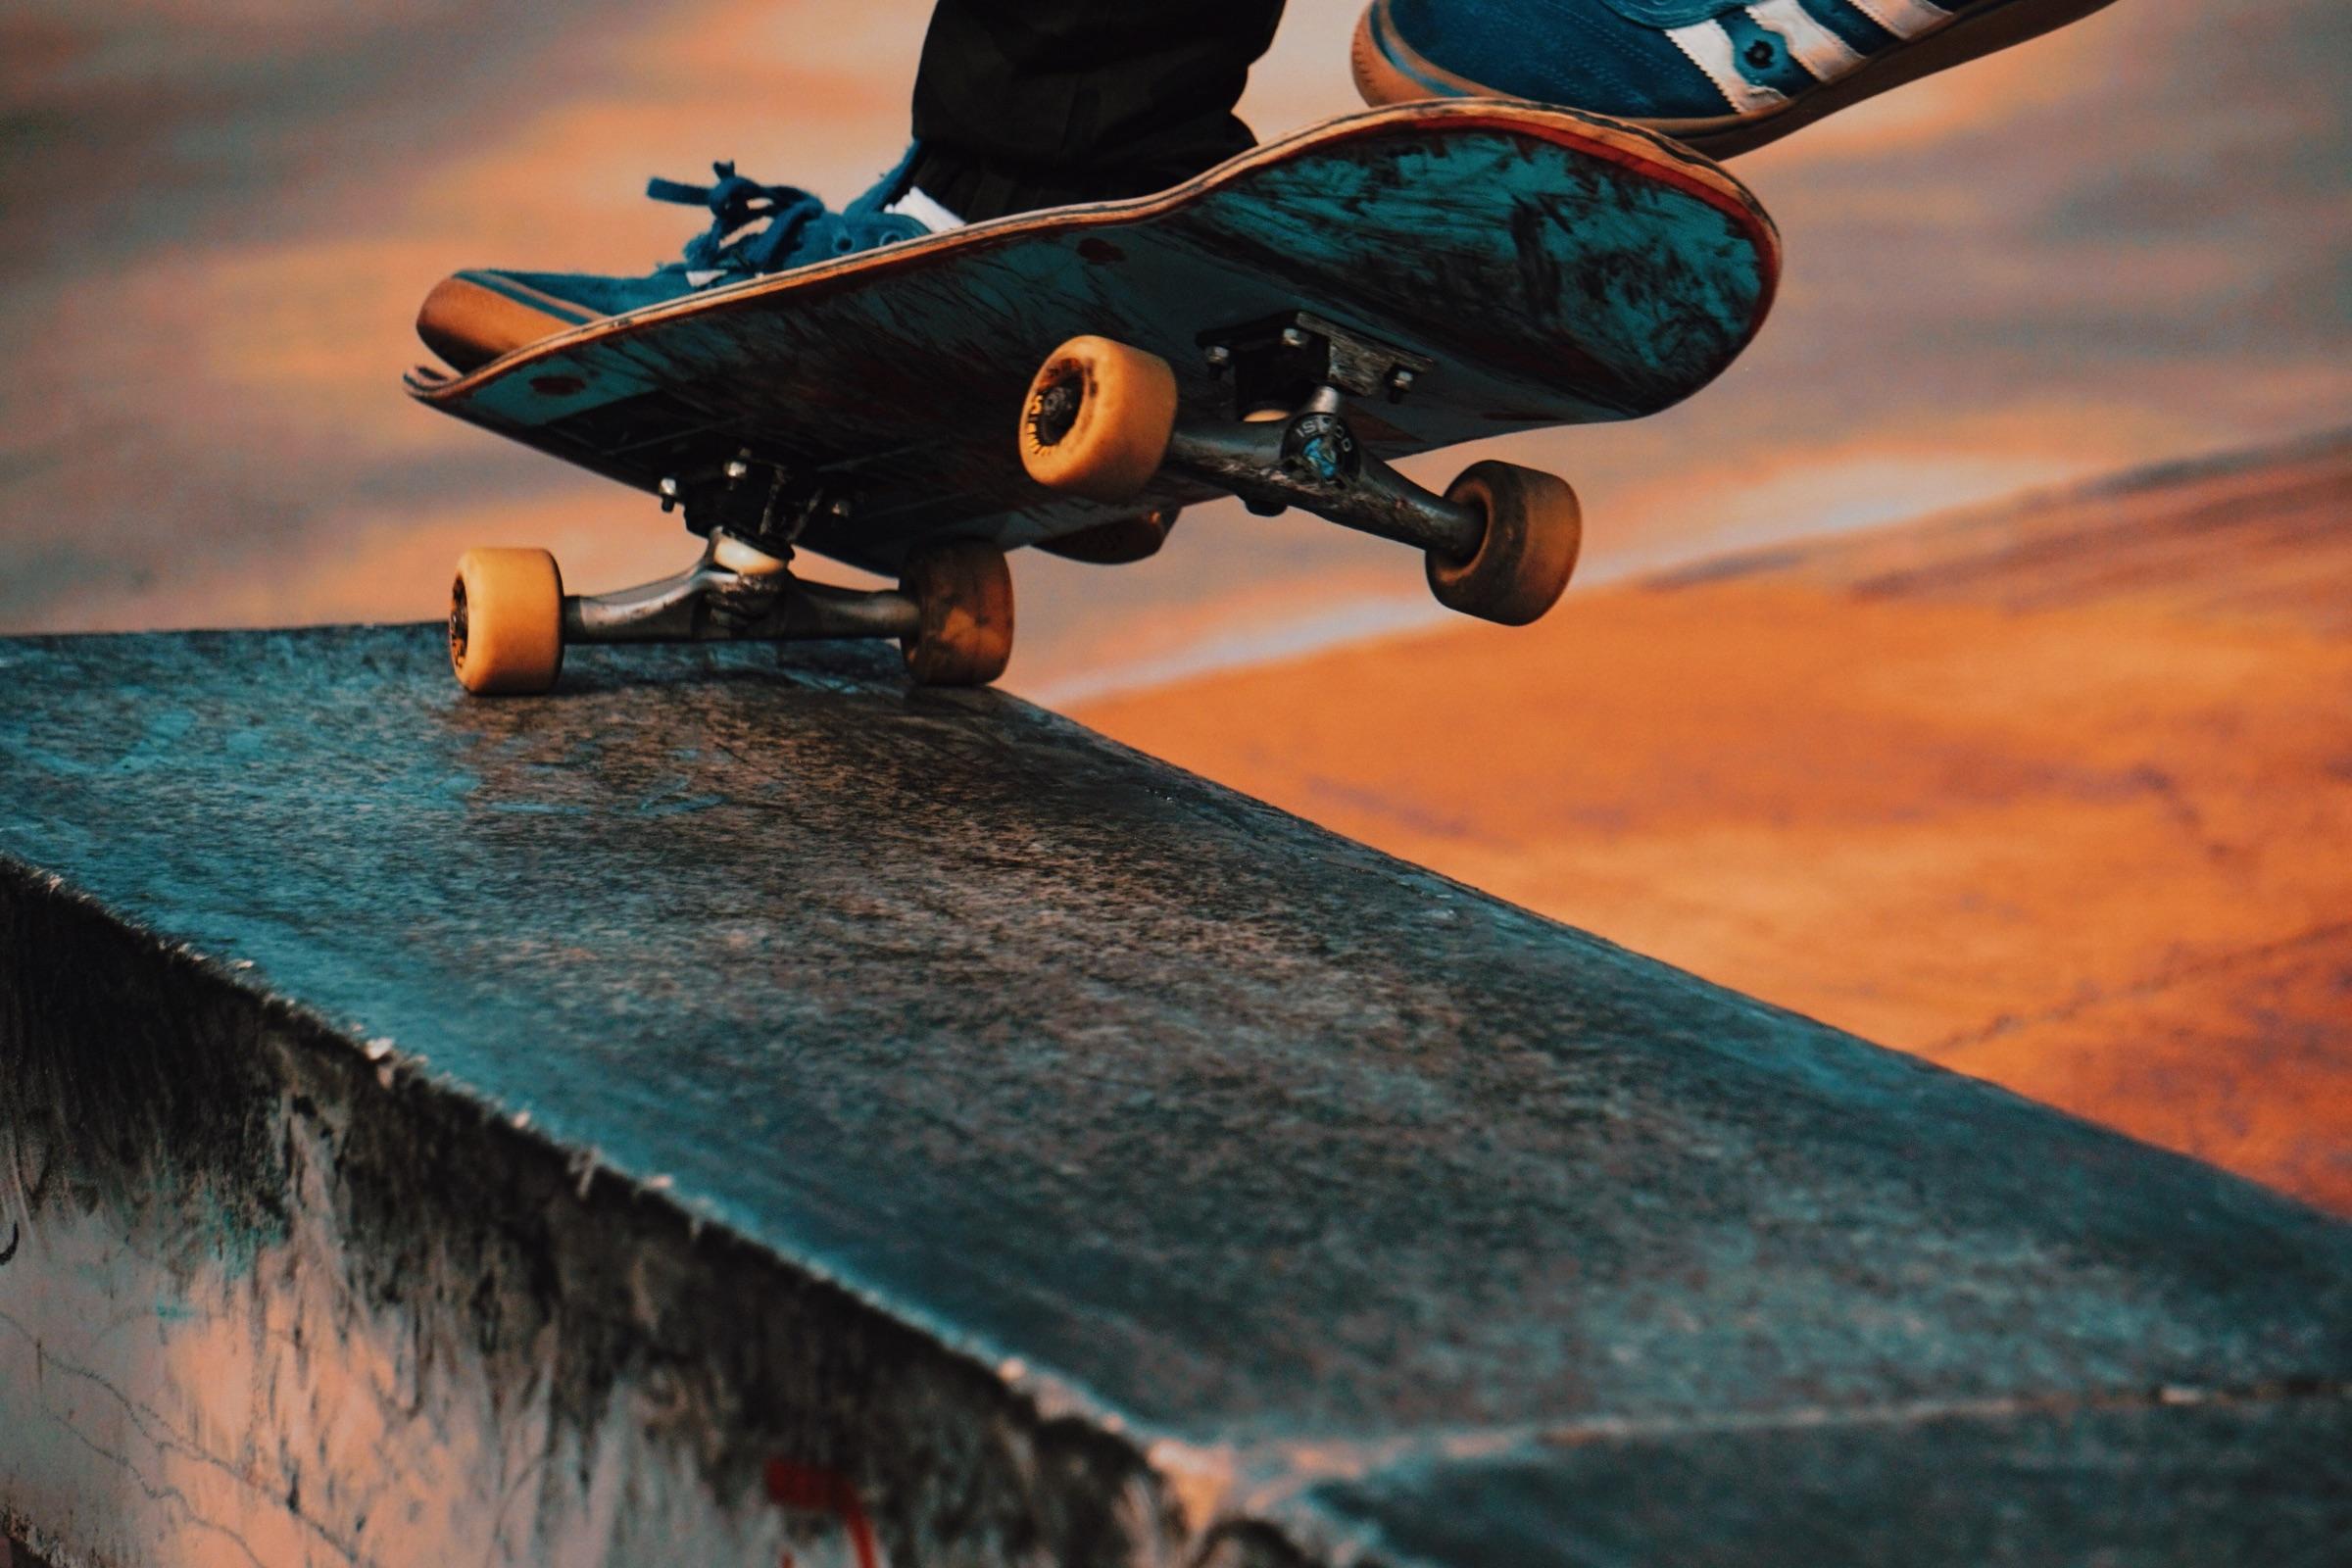 How To Make Skateboard Wax: A Home DIY Guide